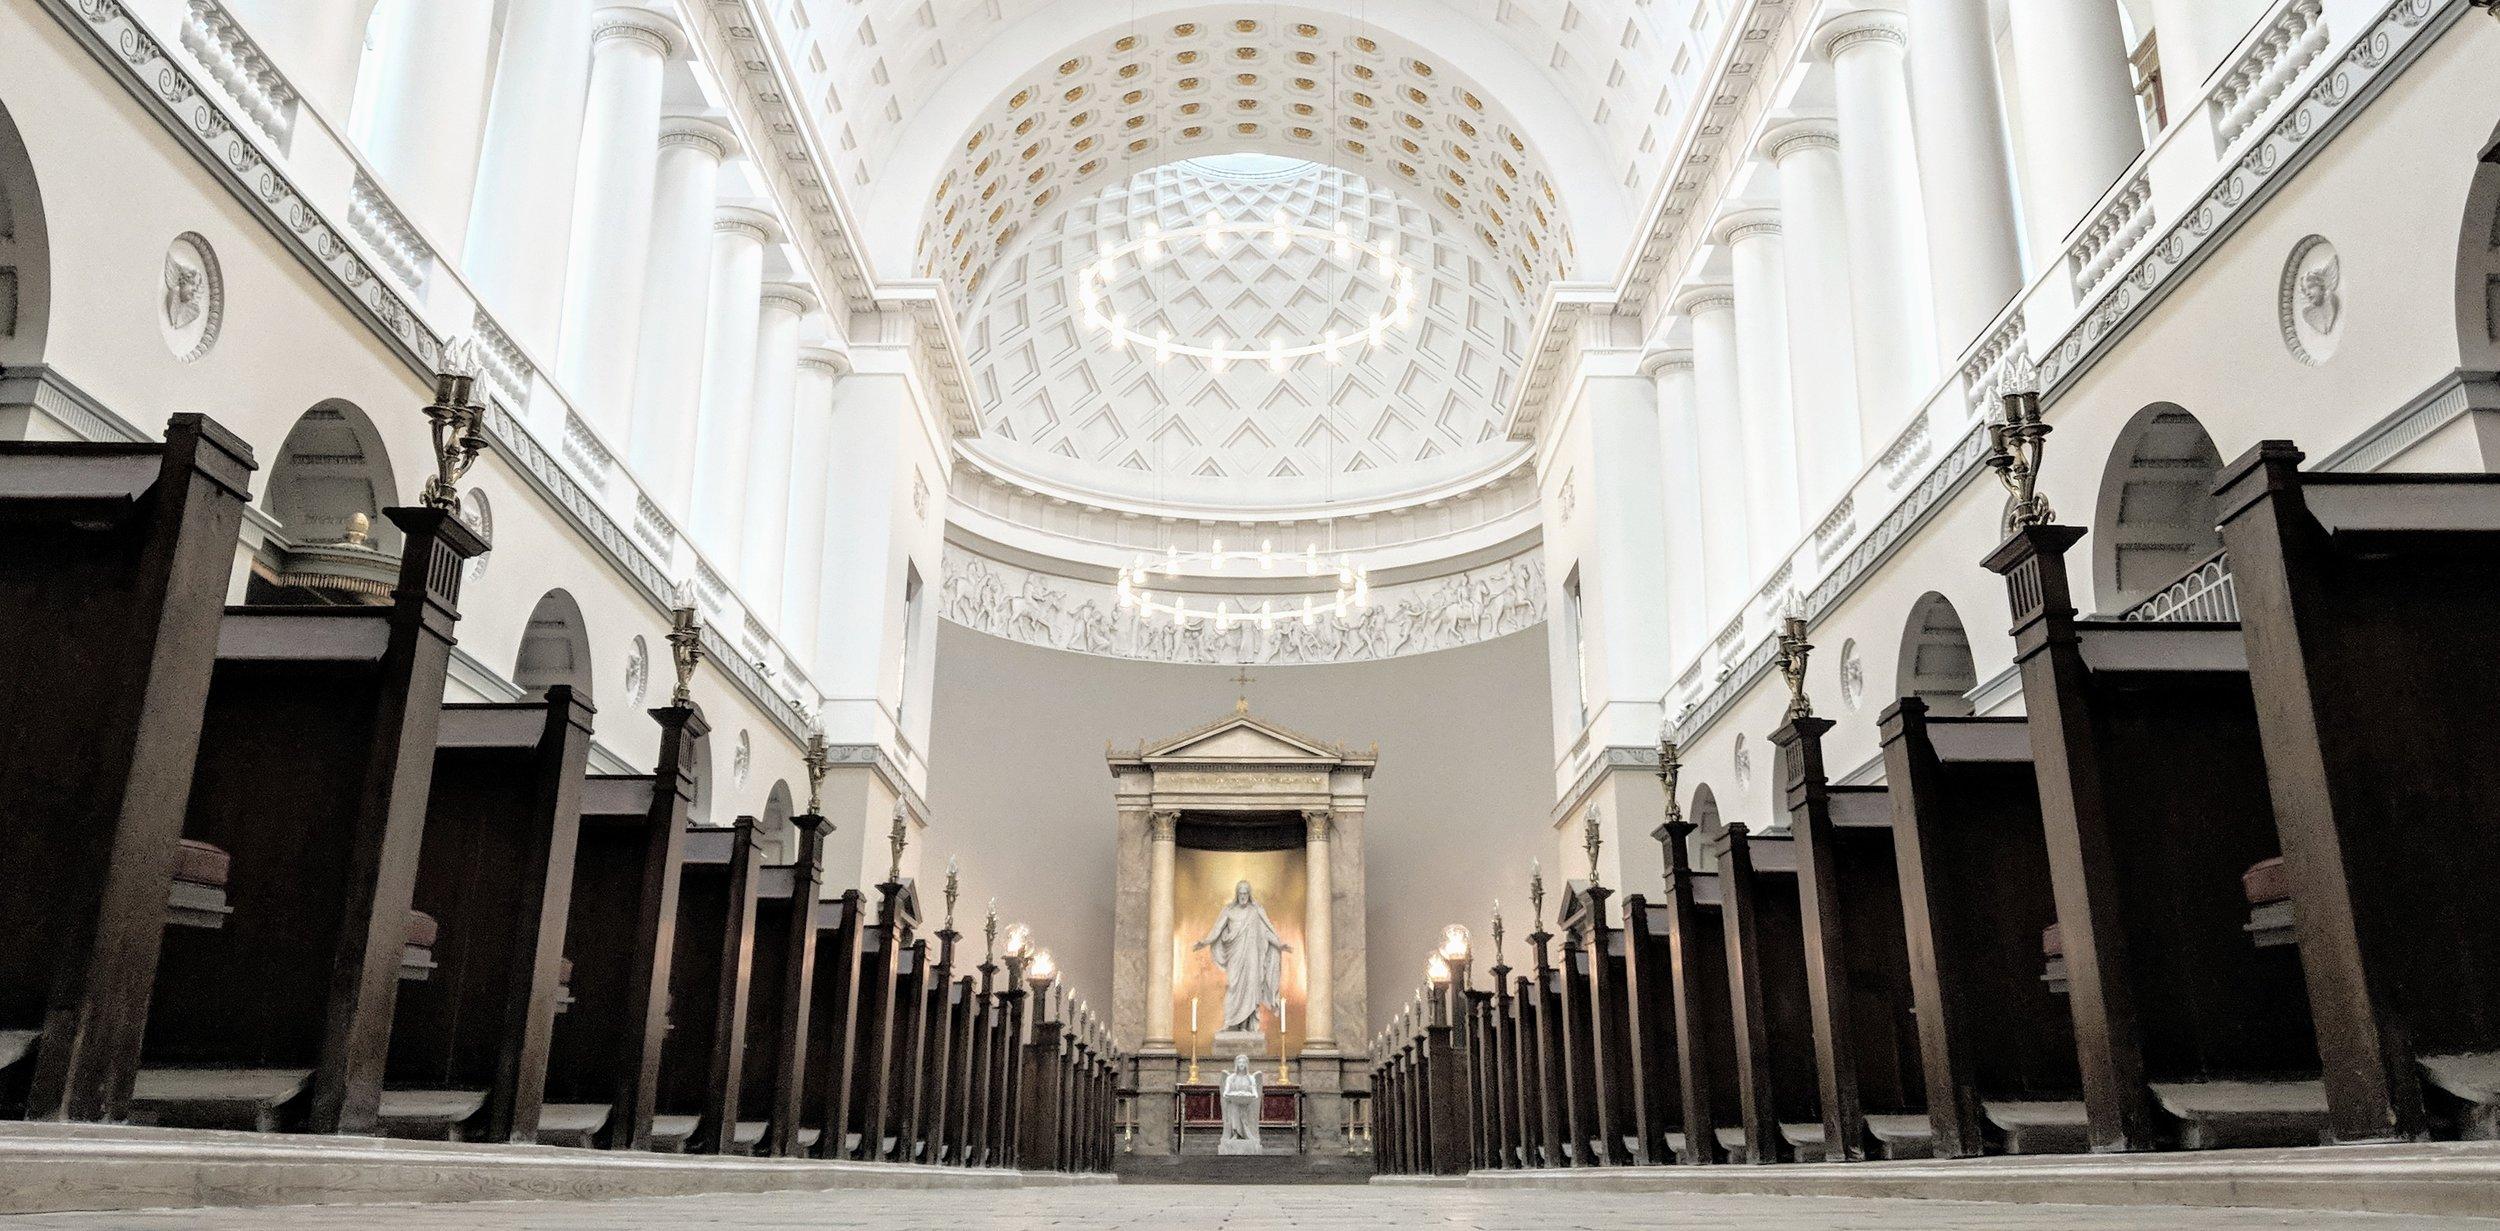 An image of the Vor Frue Kirke taken by my husband Antal Guszlev.jpg